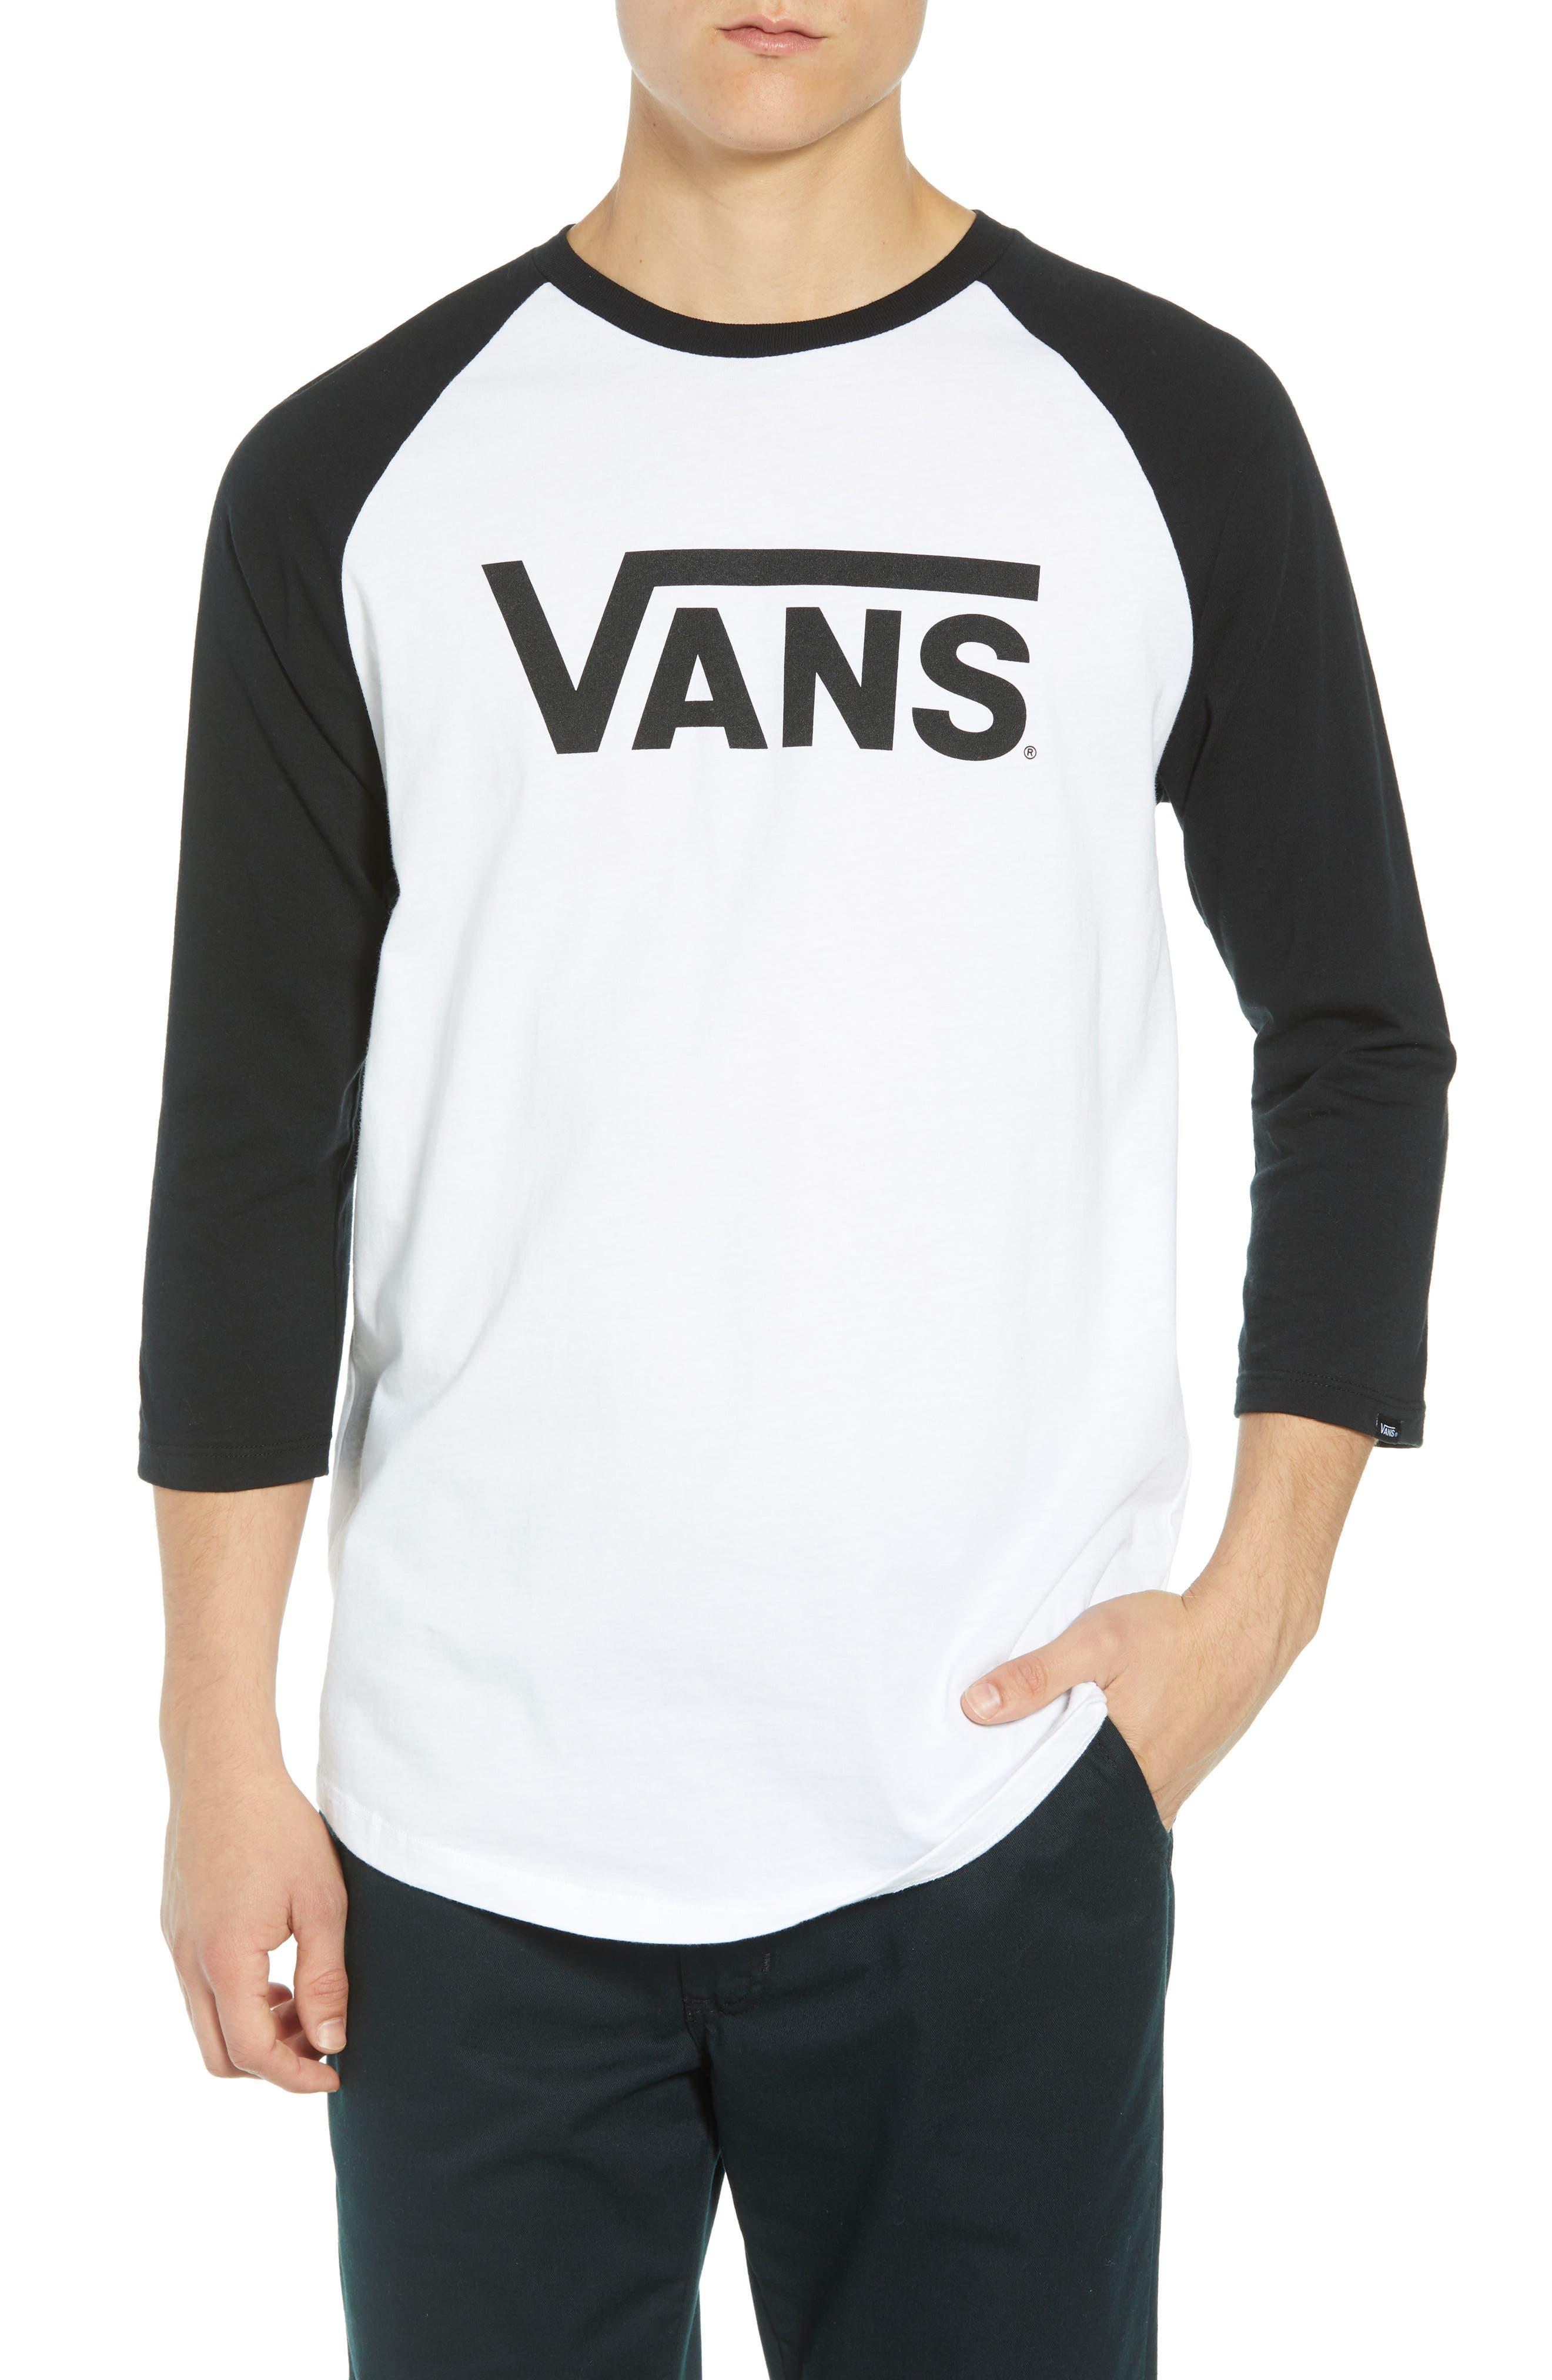 Vans Classic Raglan T-Shirt, White